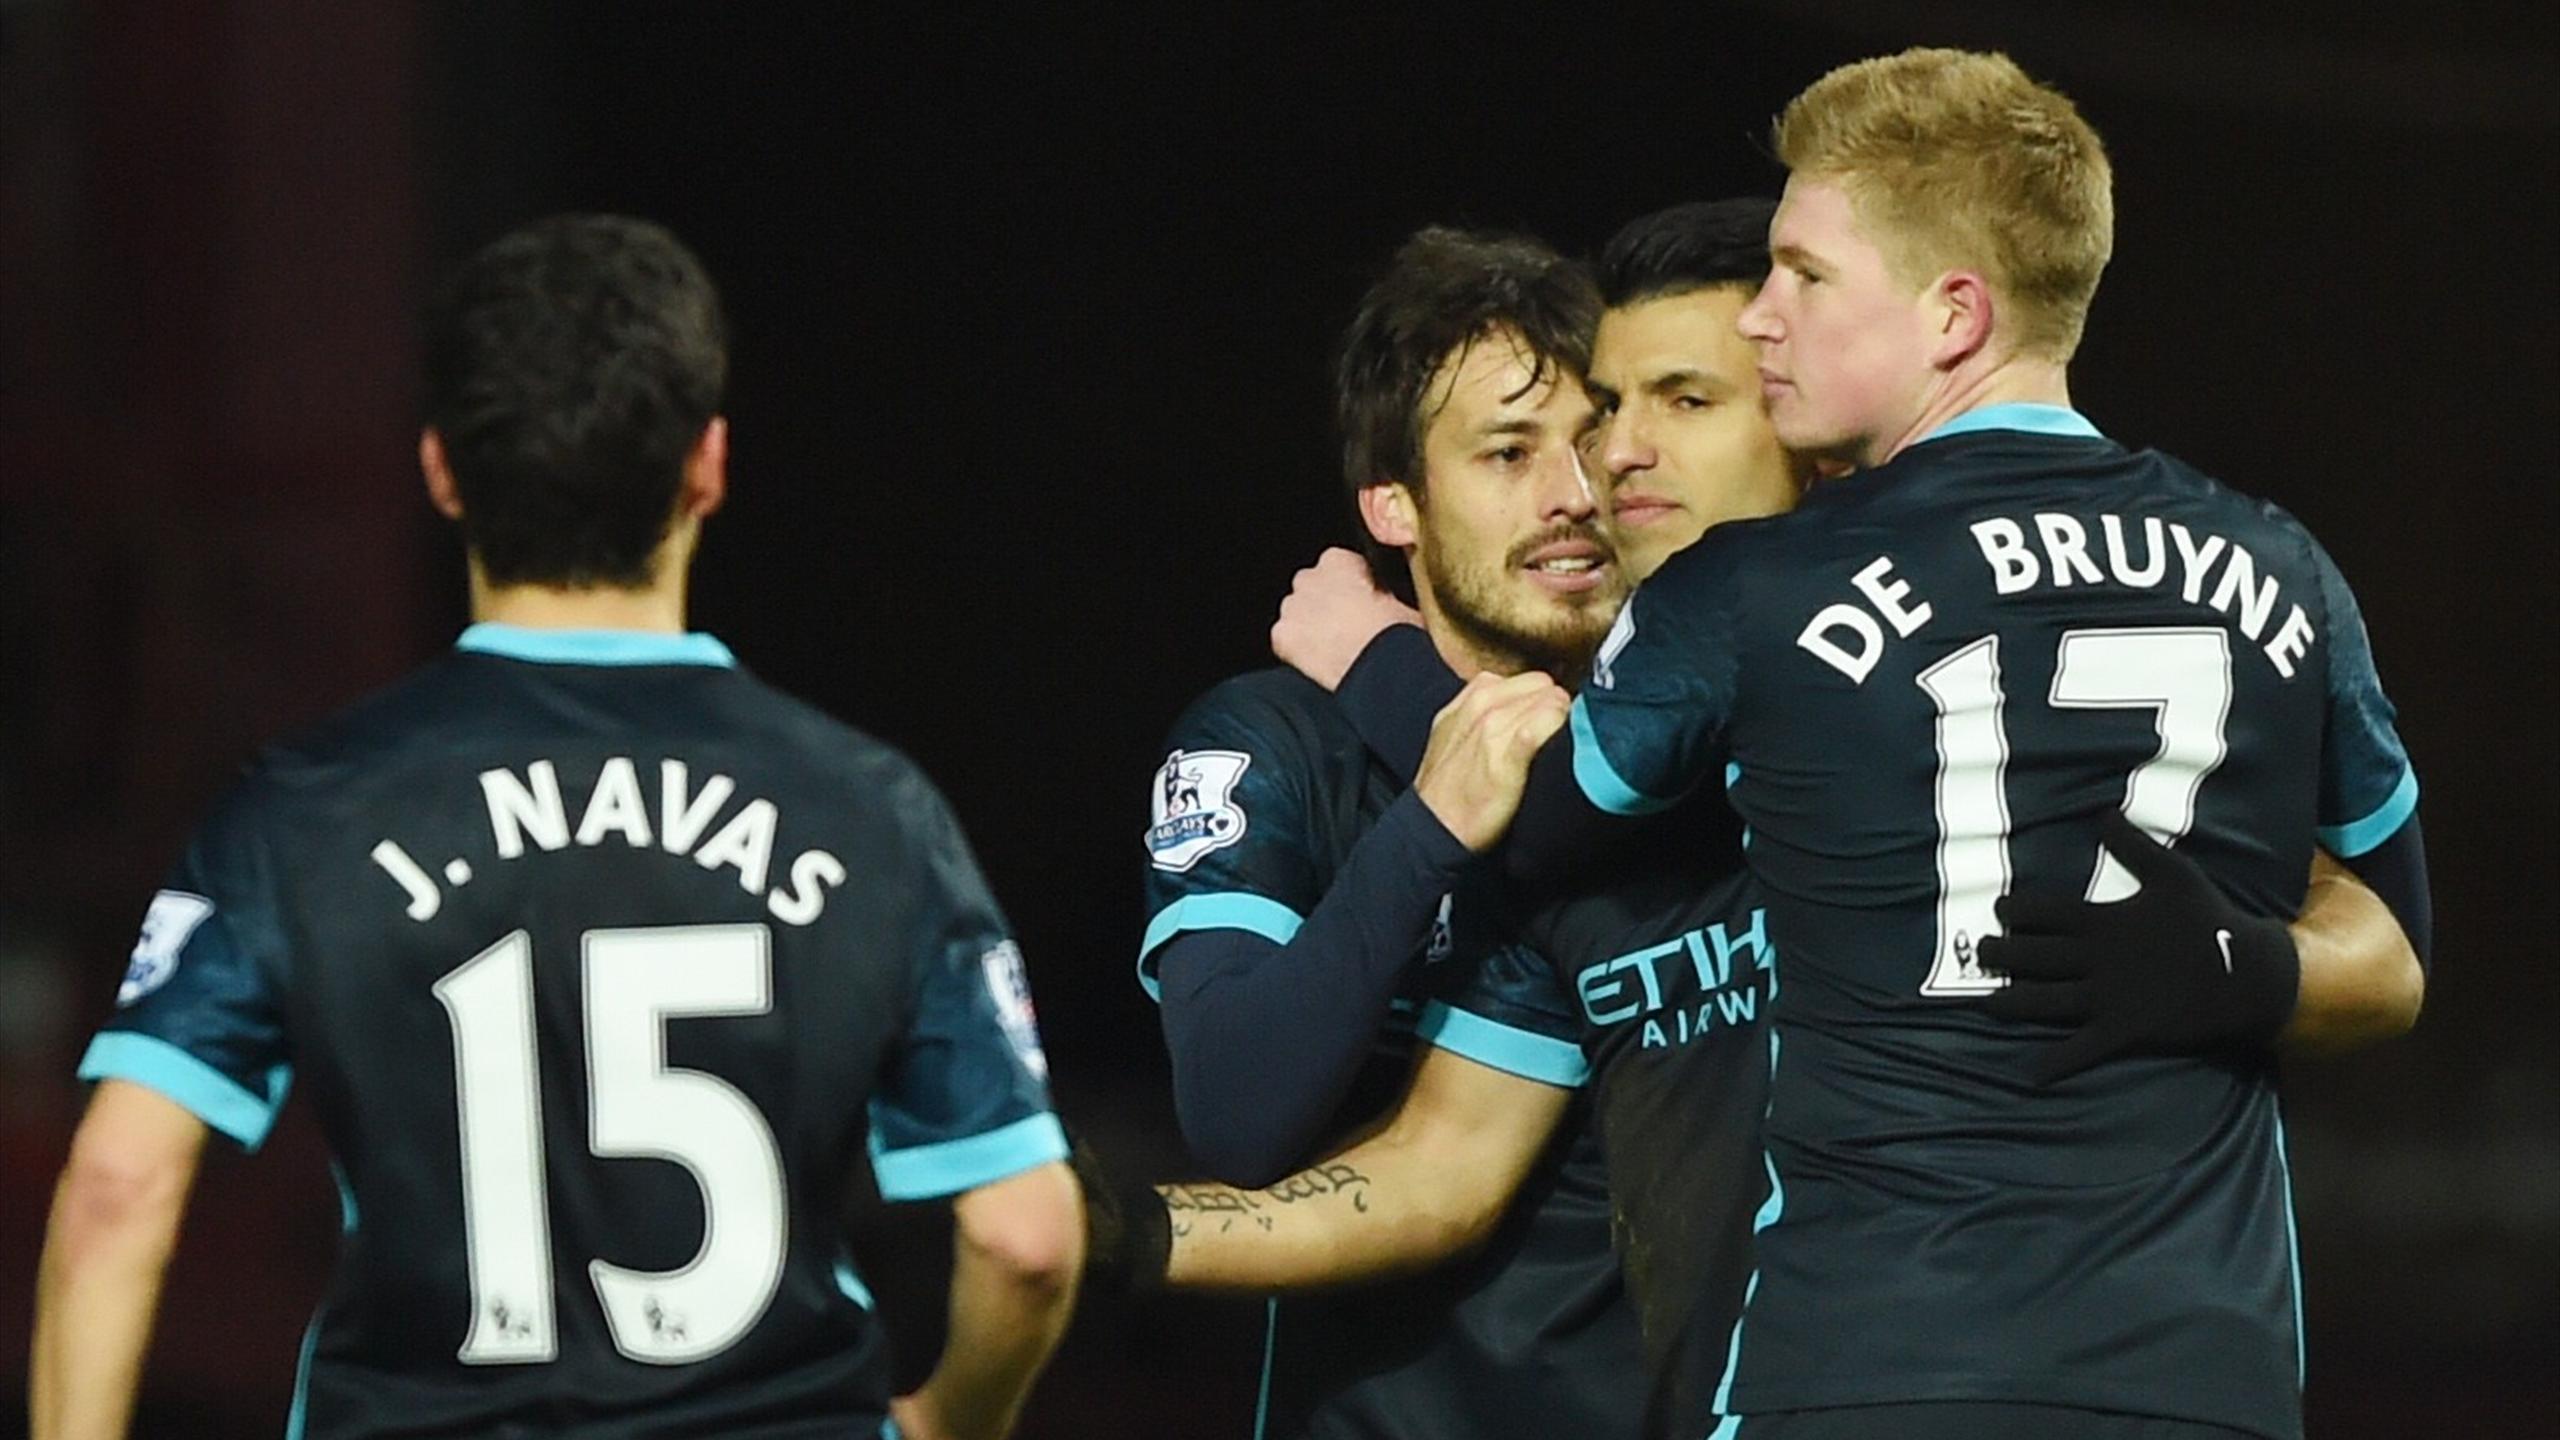 Manchester City's Sergio Aguero celebrates scoring their first goal with Kevin de Bruyne, David Silva and Jesus Navas